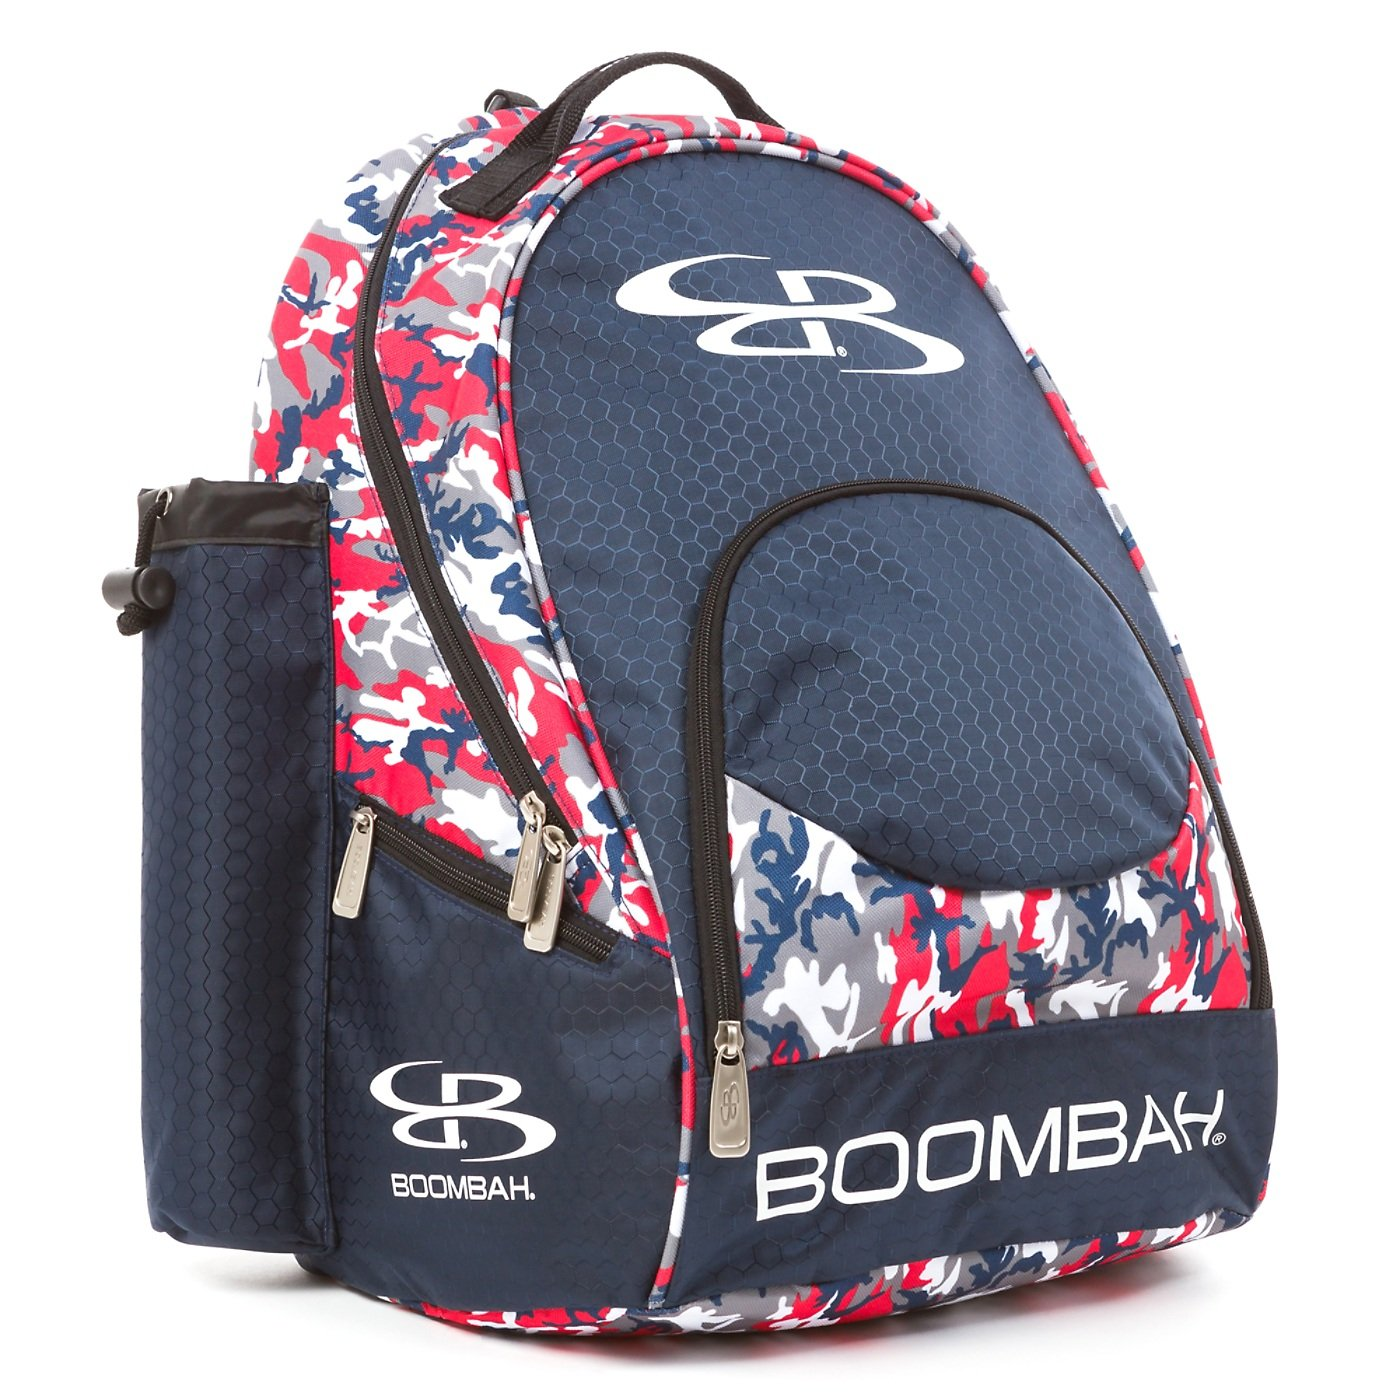 BoombahテューローBaseball / Softball Batバックパック – 20